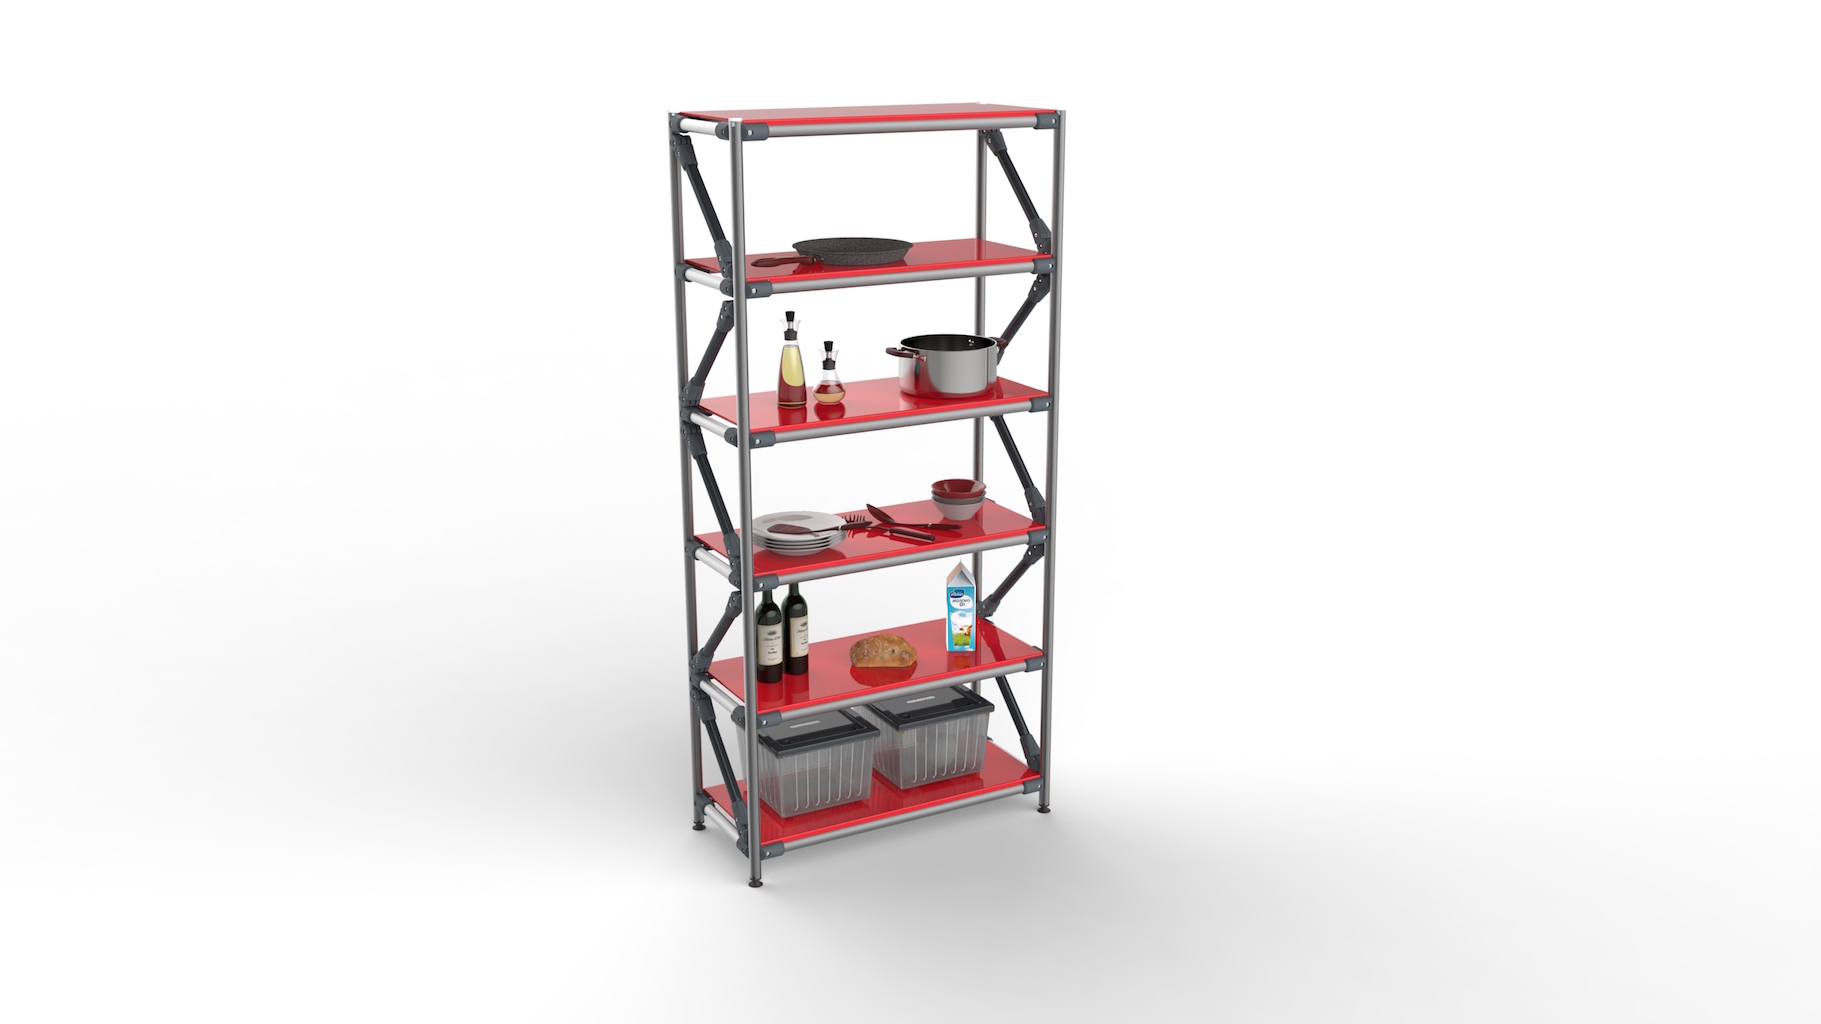 Adjustable multi-purpose shelving